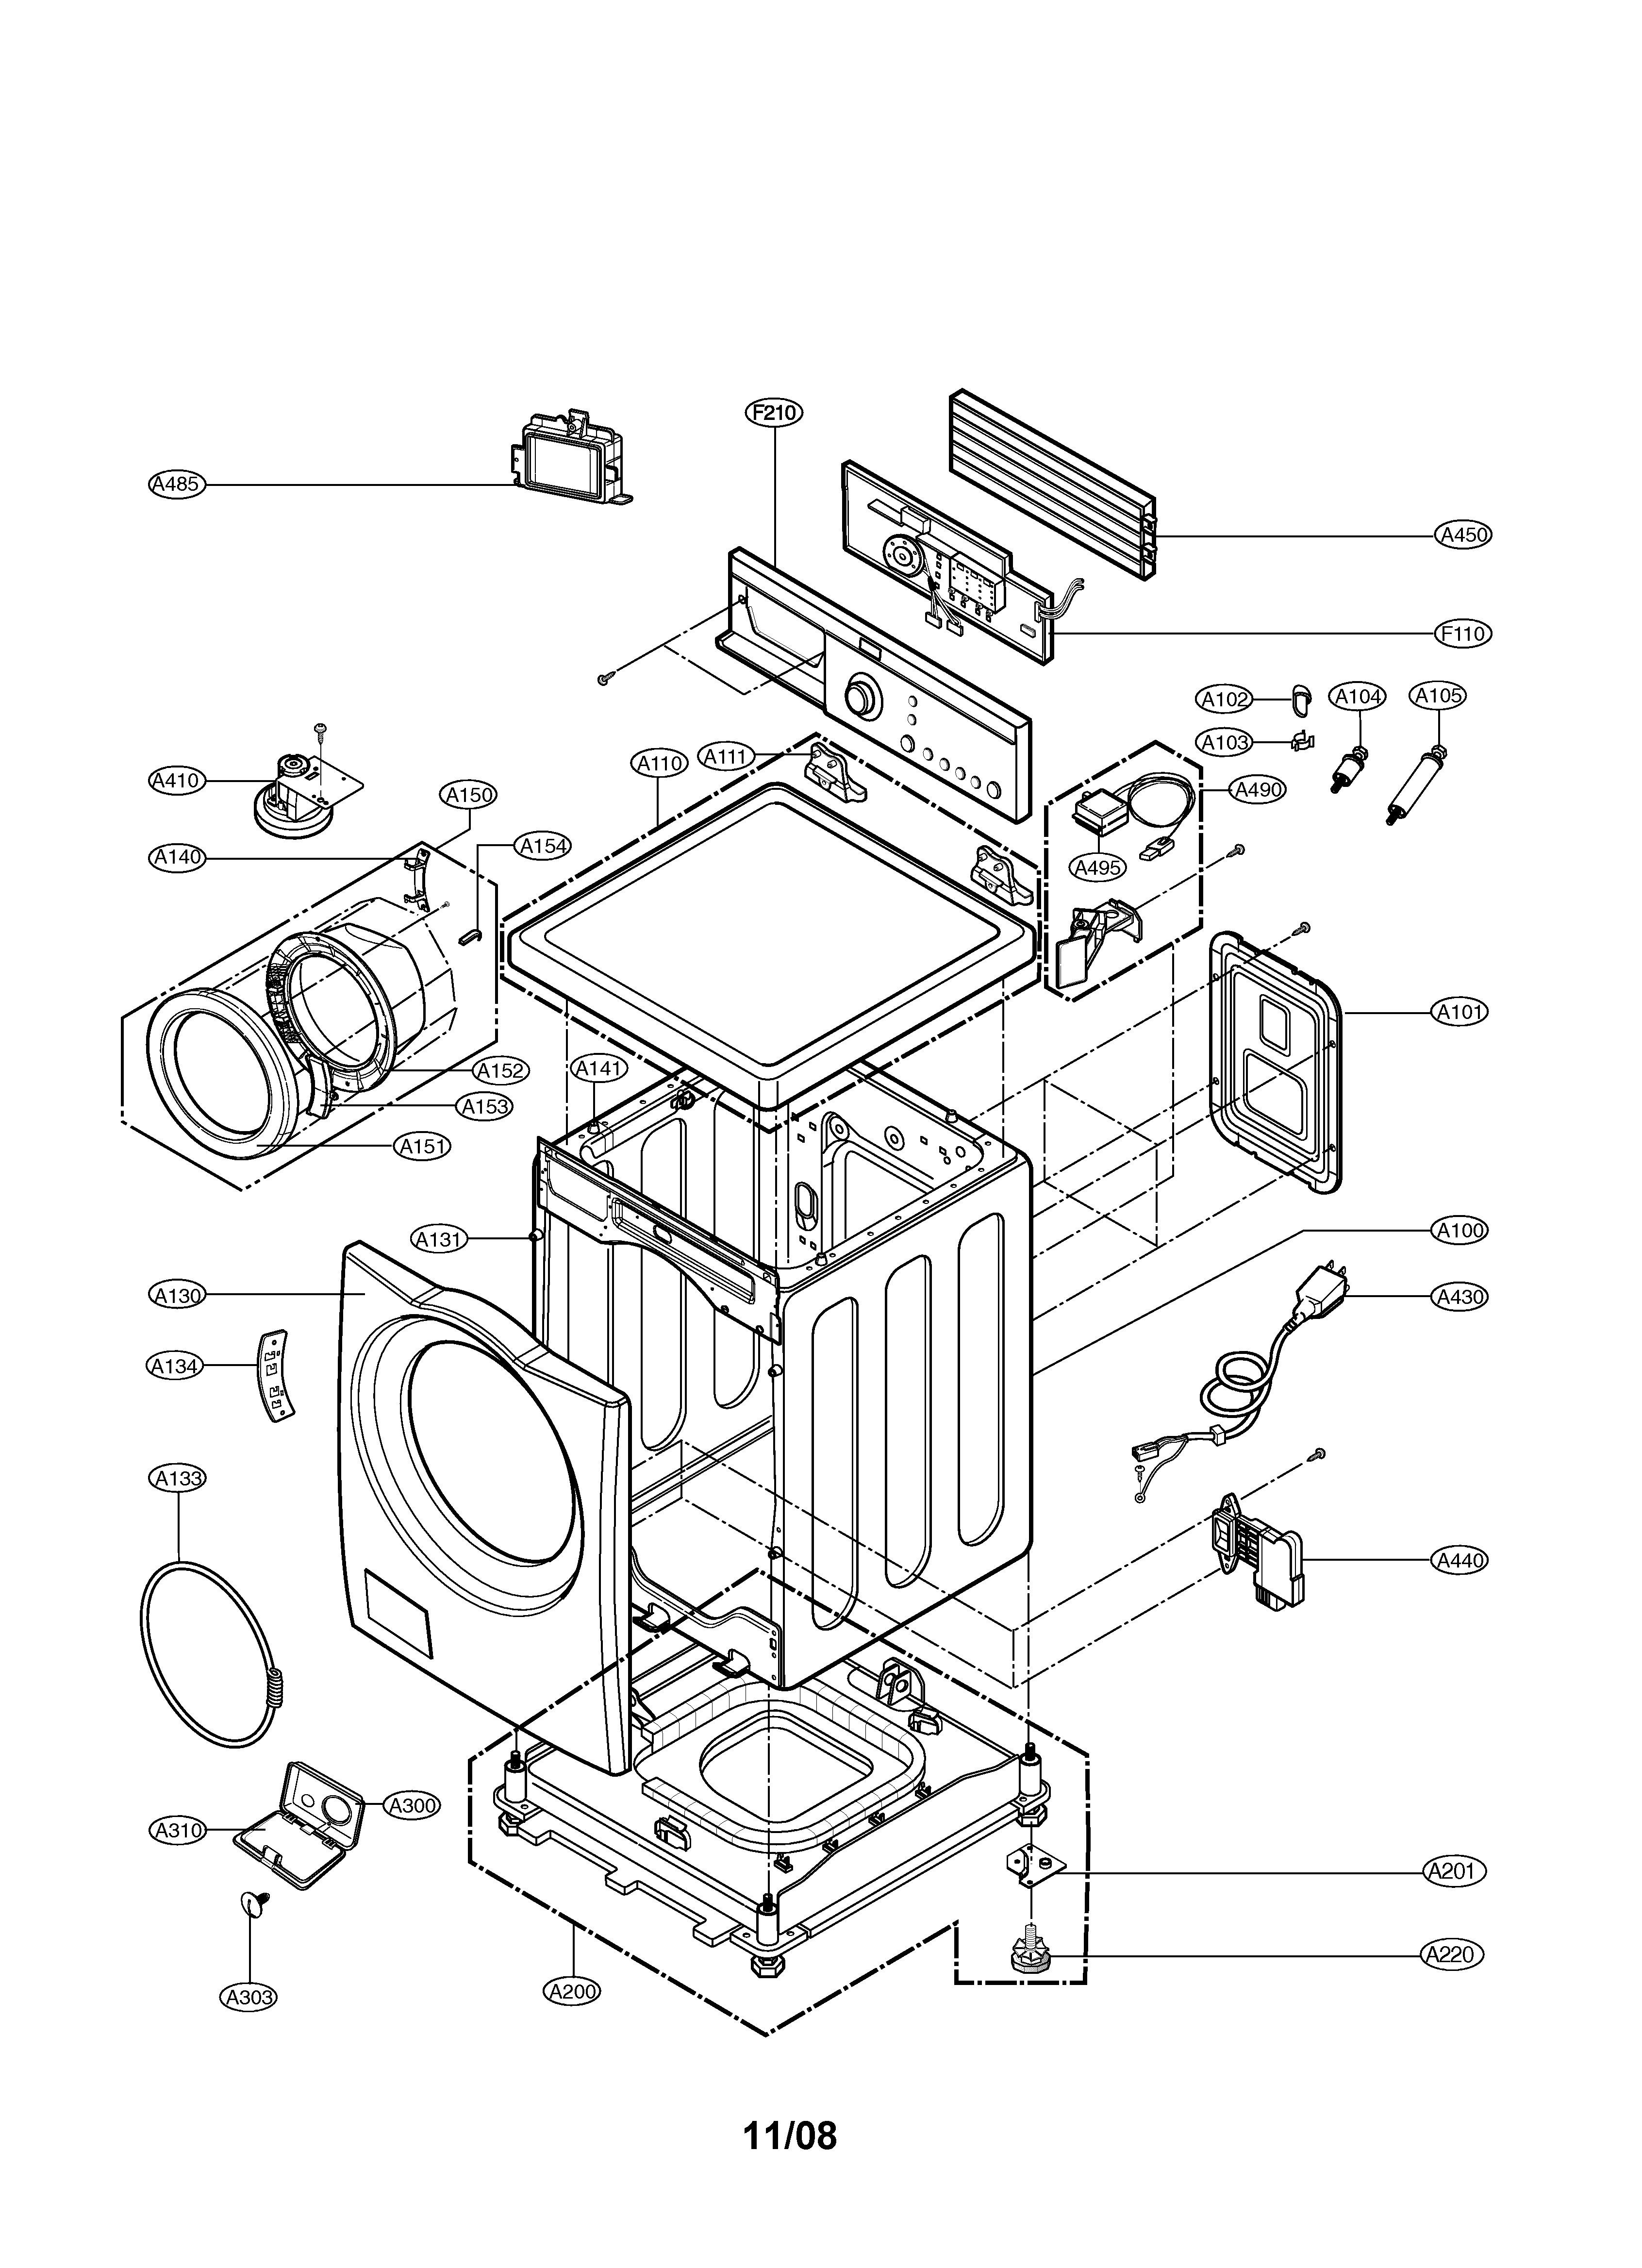 Ge Xl44 Parts Diagram Lg Model Wm1812cw Residential Washers Genuine Maytag Washer Control Panel Mah4000aww